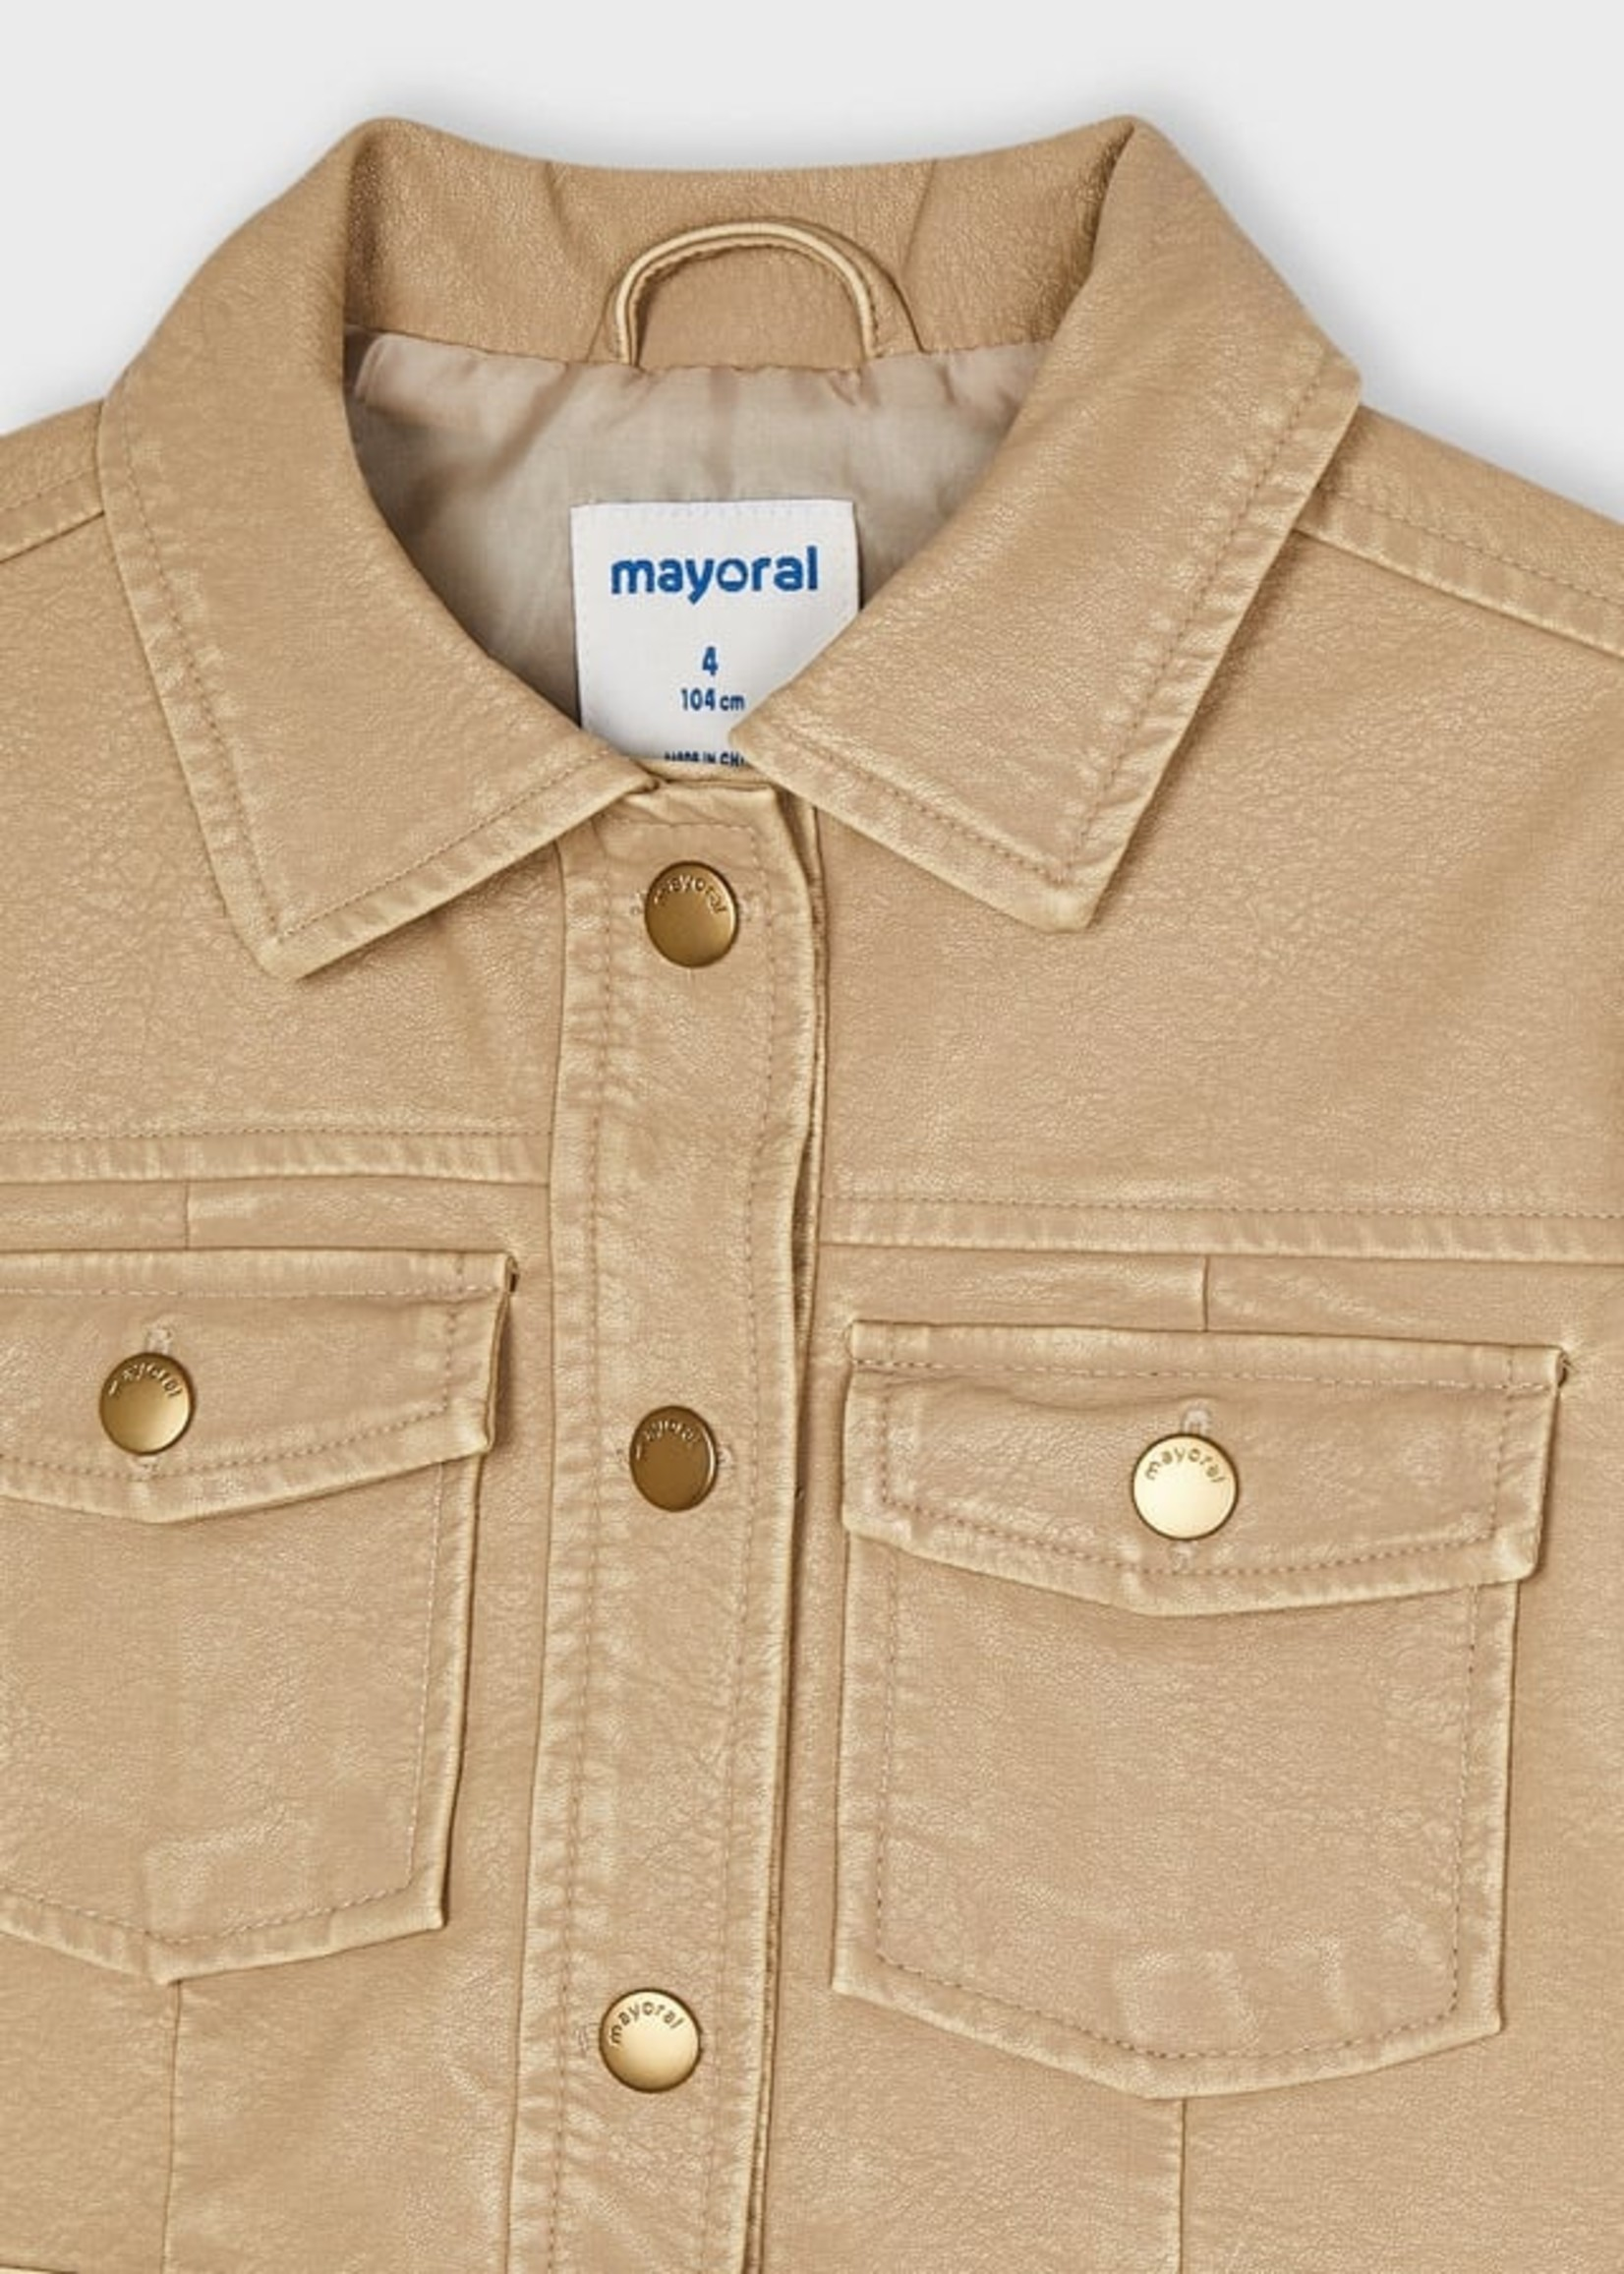 Mayoral Mayoral faux leather jacket for girl camel